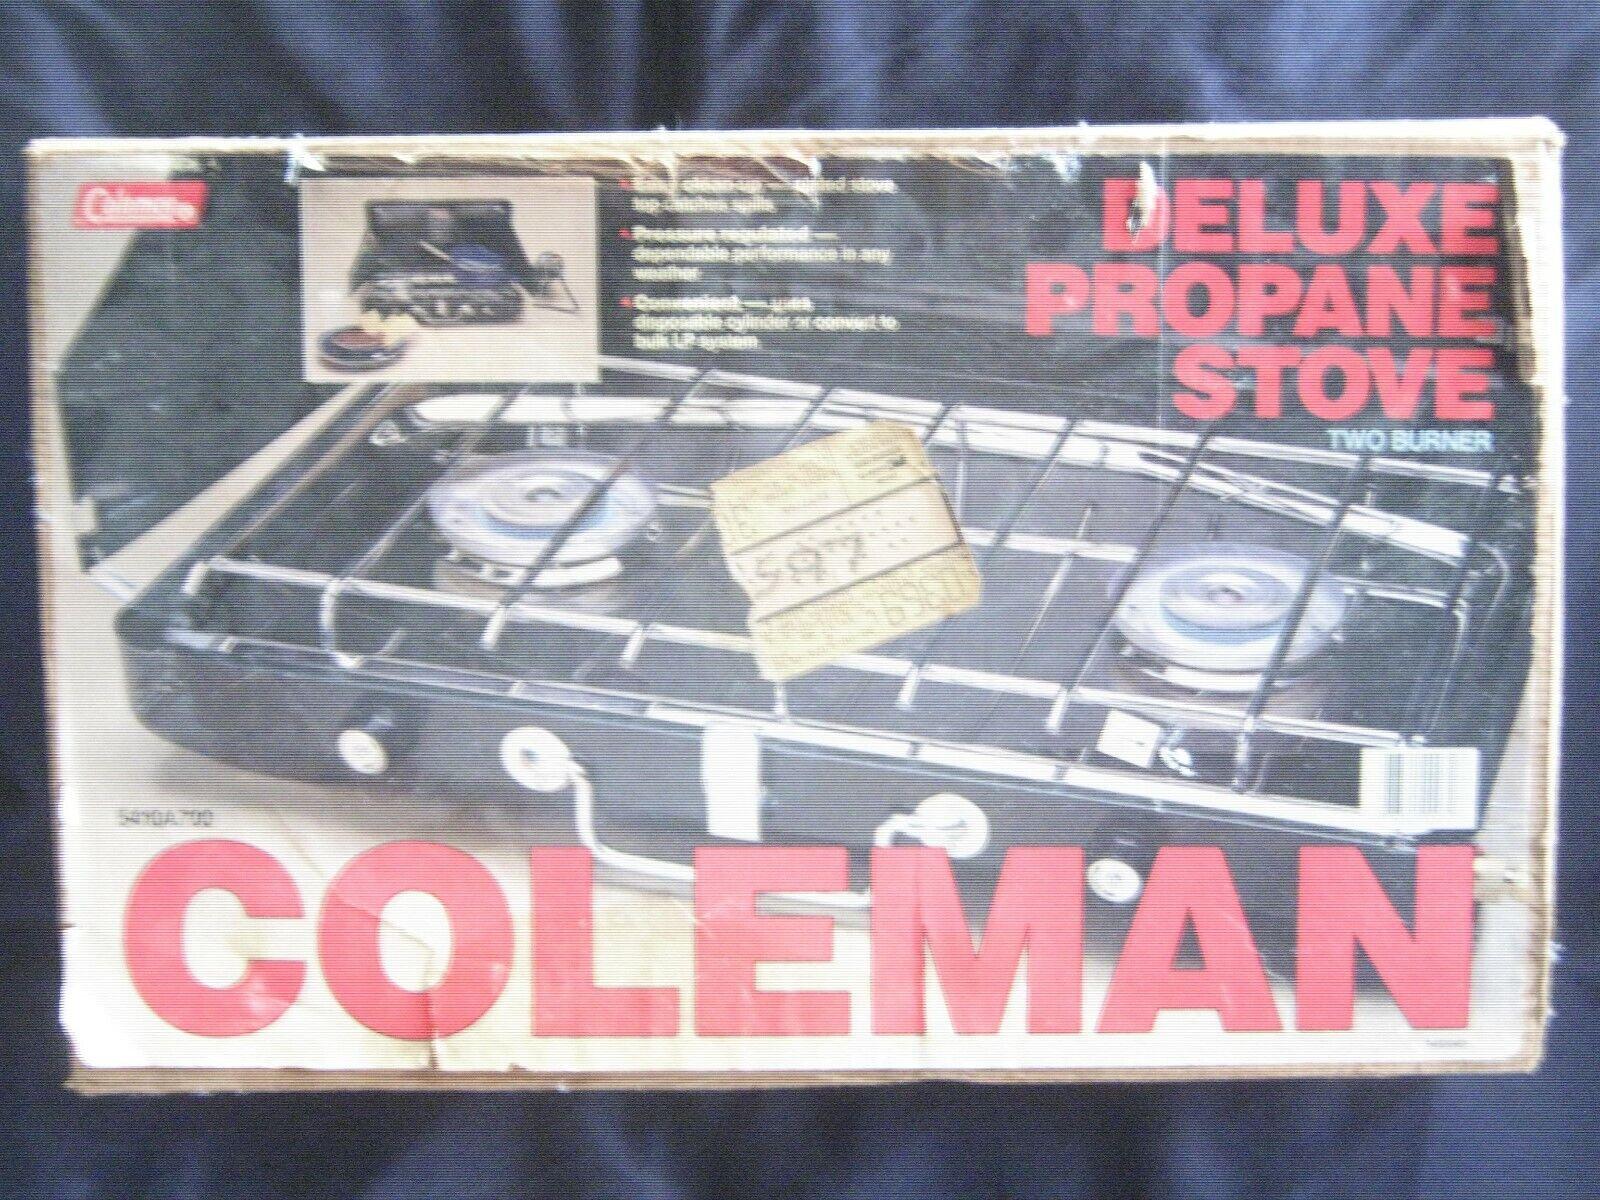 Coleman Deluxe Propane Campstove 2 Burner 5410A700 ORIGINAL UNOPENED BOX  - Kmart  cheaper prices